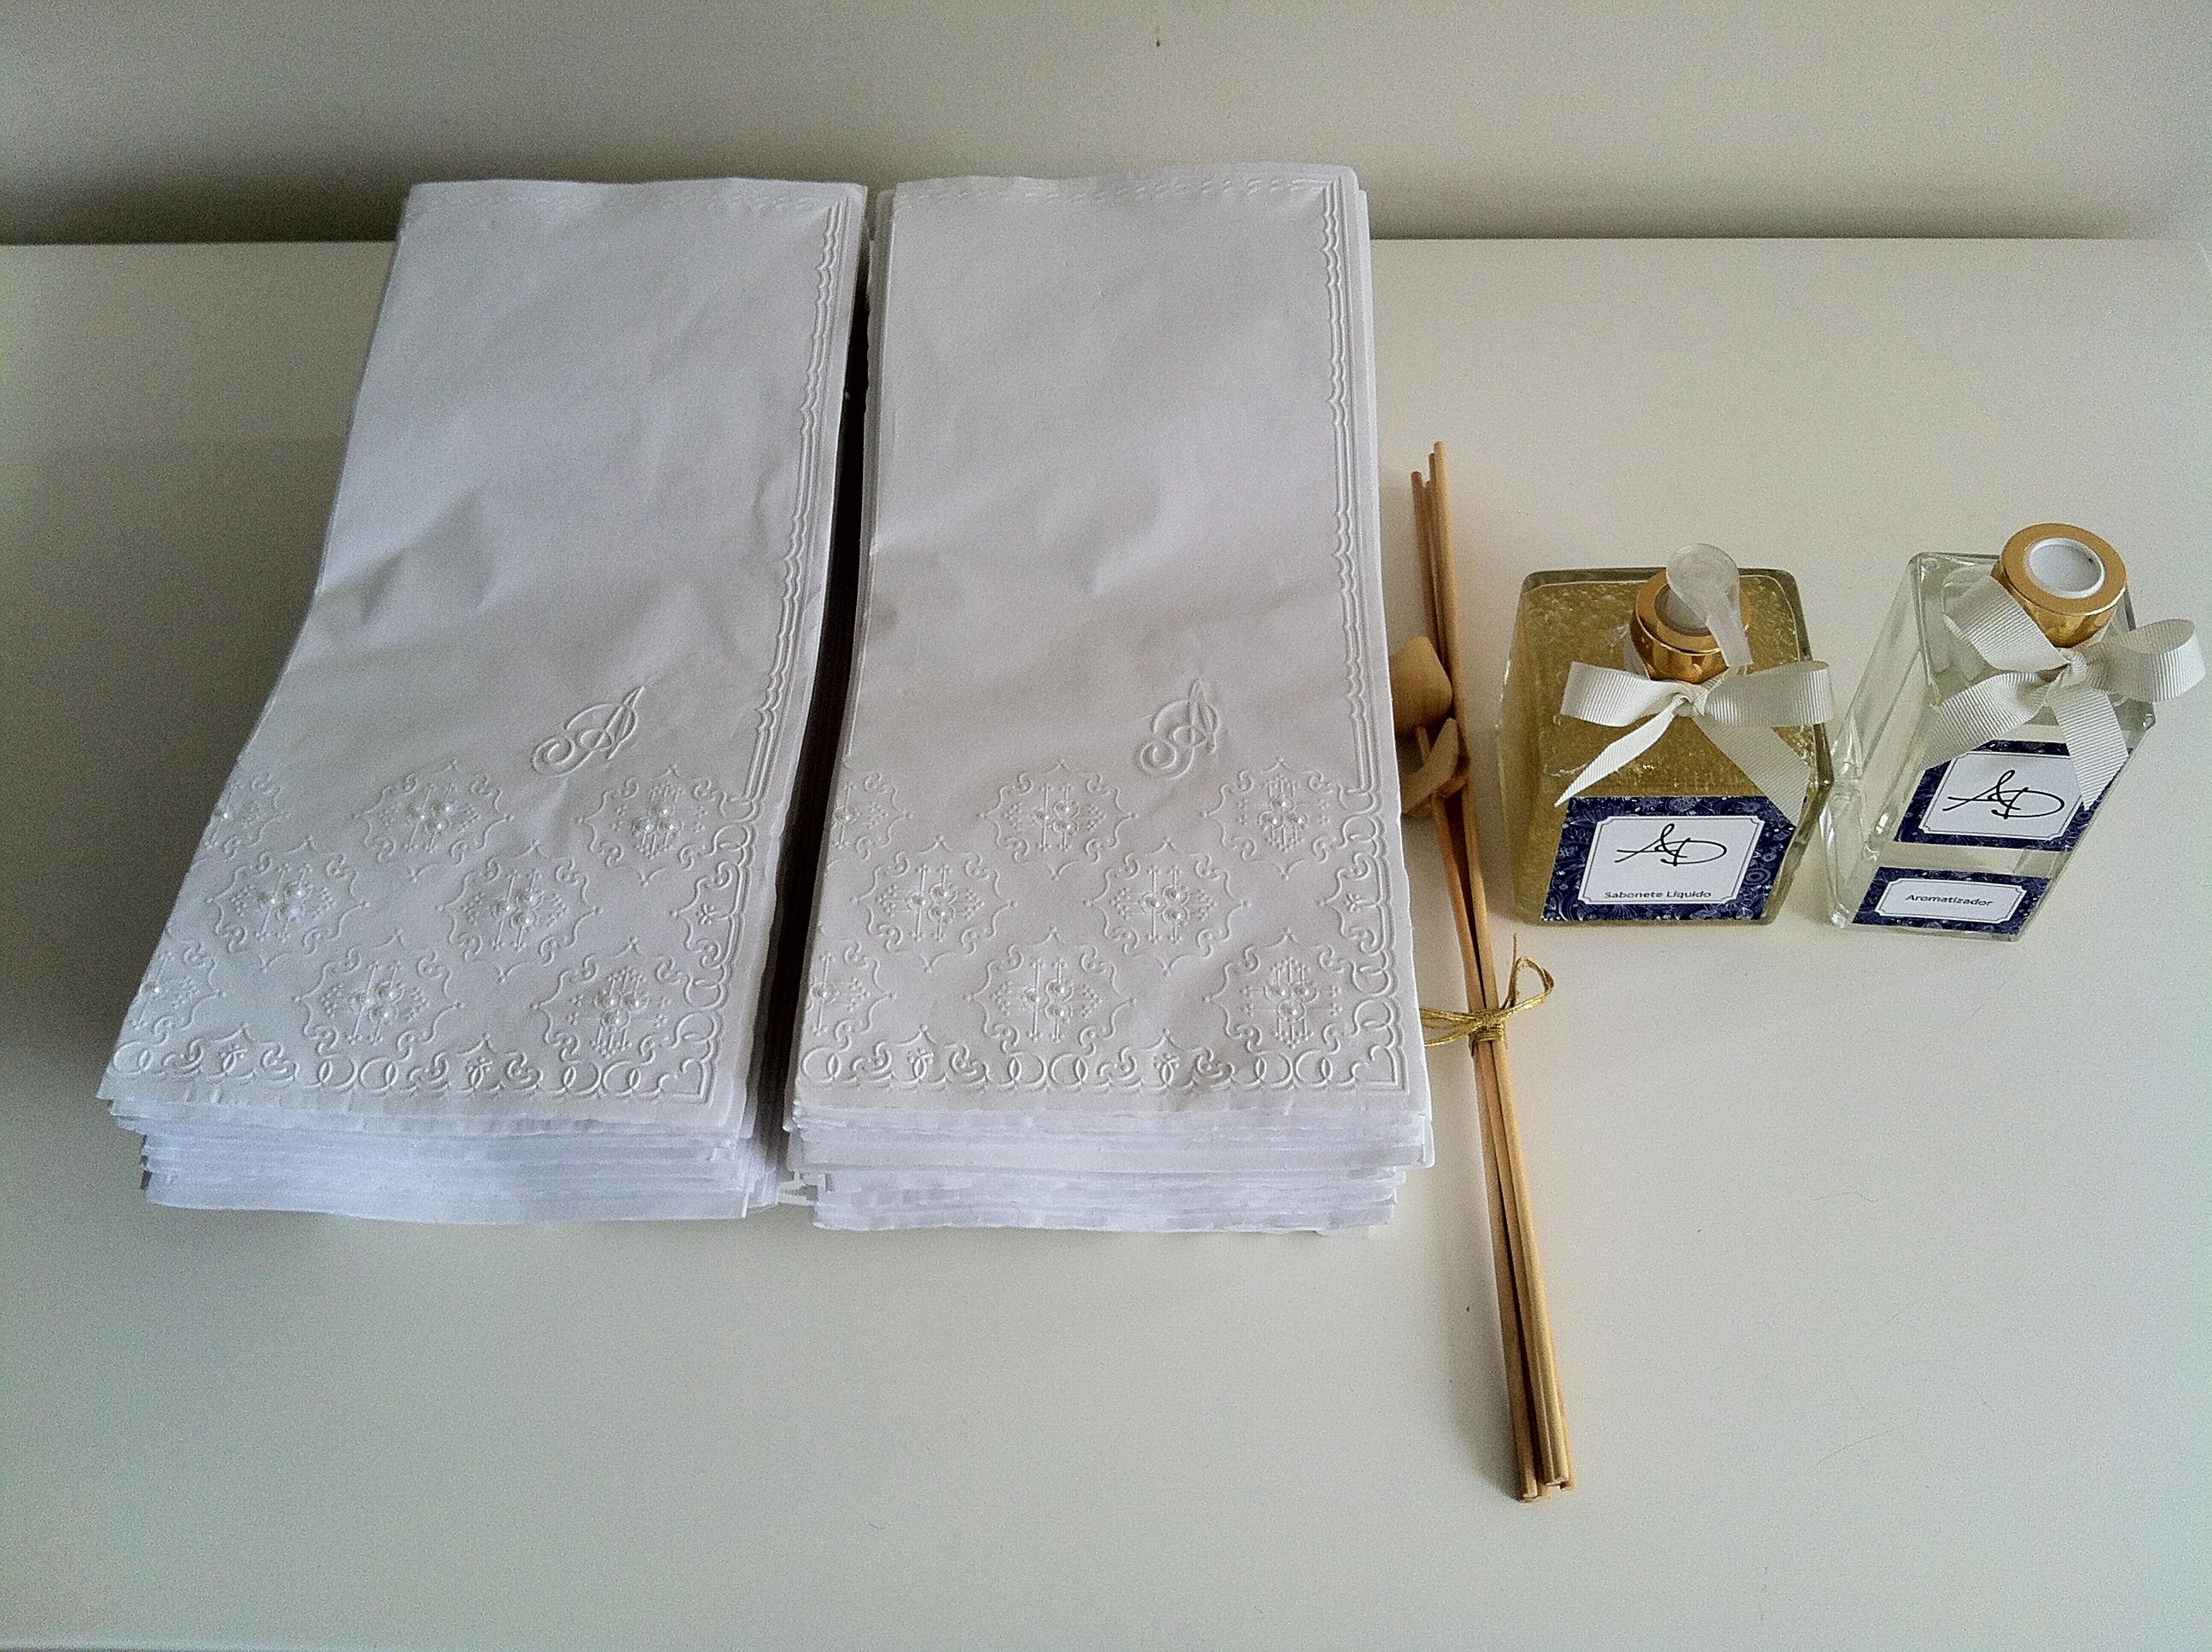 decoracao bandeja lavabo : decoracao bandeja lavabo:lavabo-com-bandeja-e-toalha-de-papel-decoracao kit-lavabo-com-bandeja